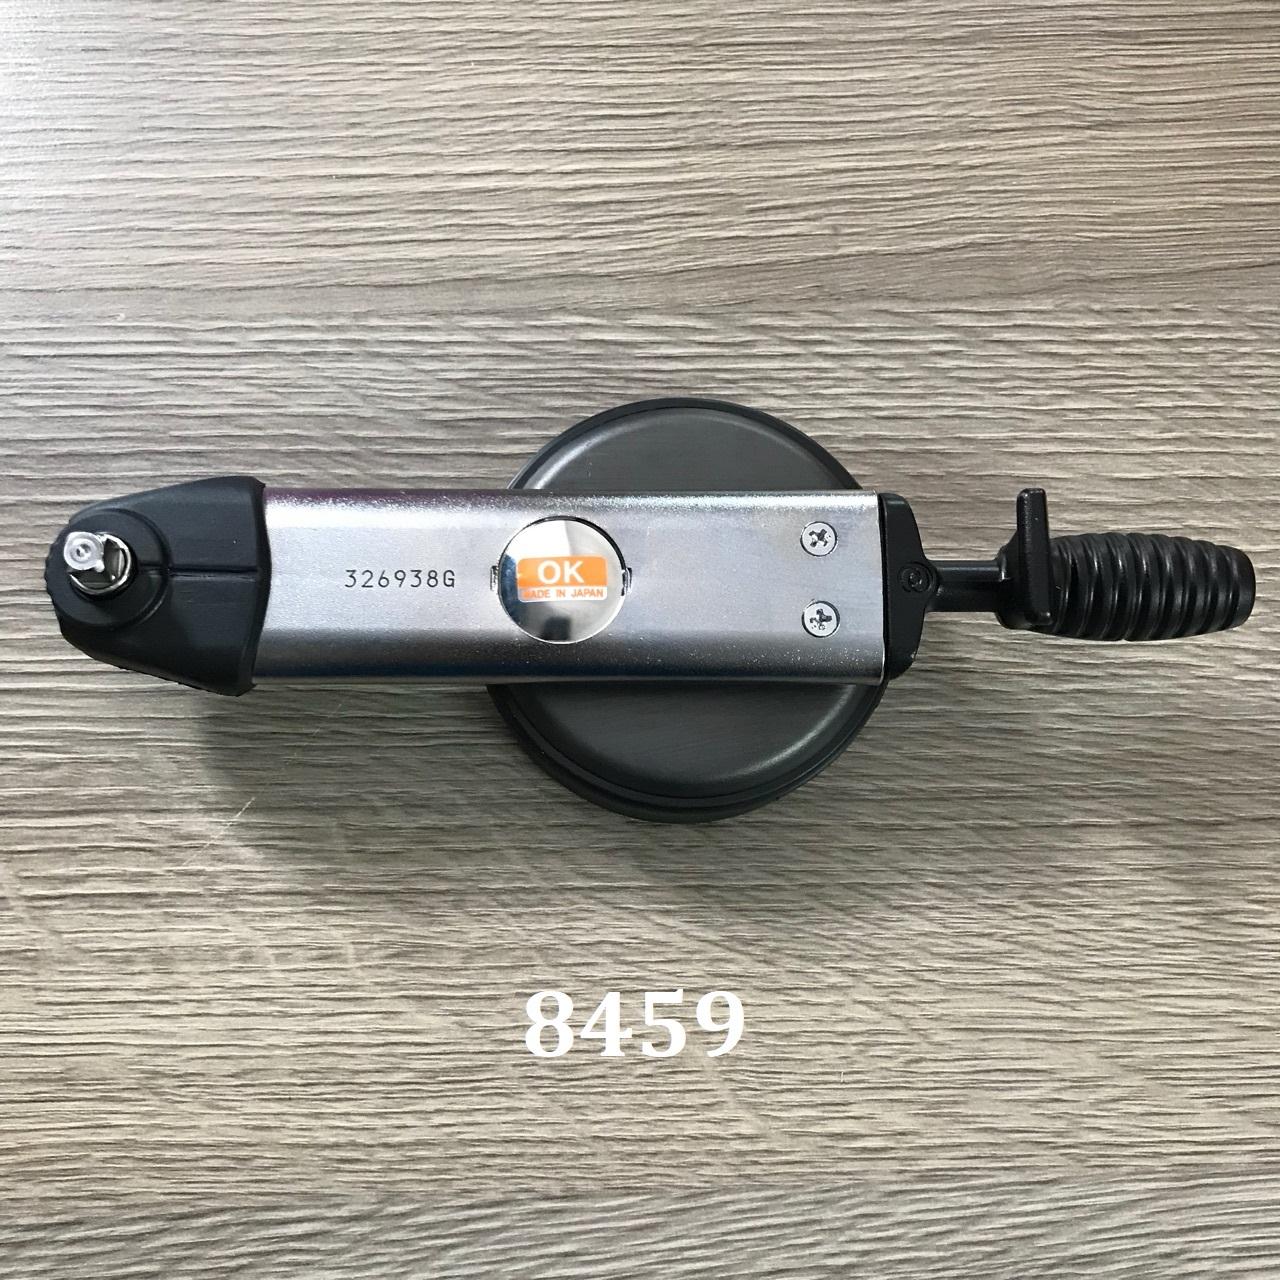 Thiết bị đo lực xoắn siết có dải đo 1~12N.m  DB12N4-S Tohnichi